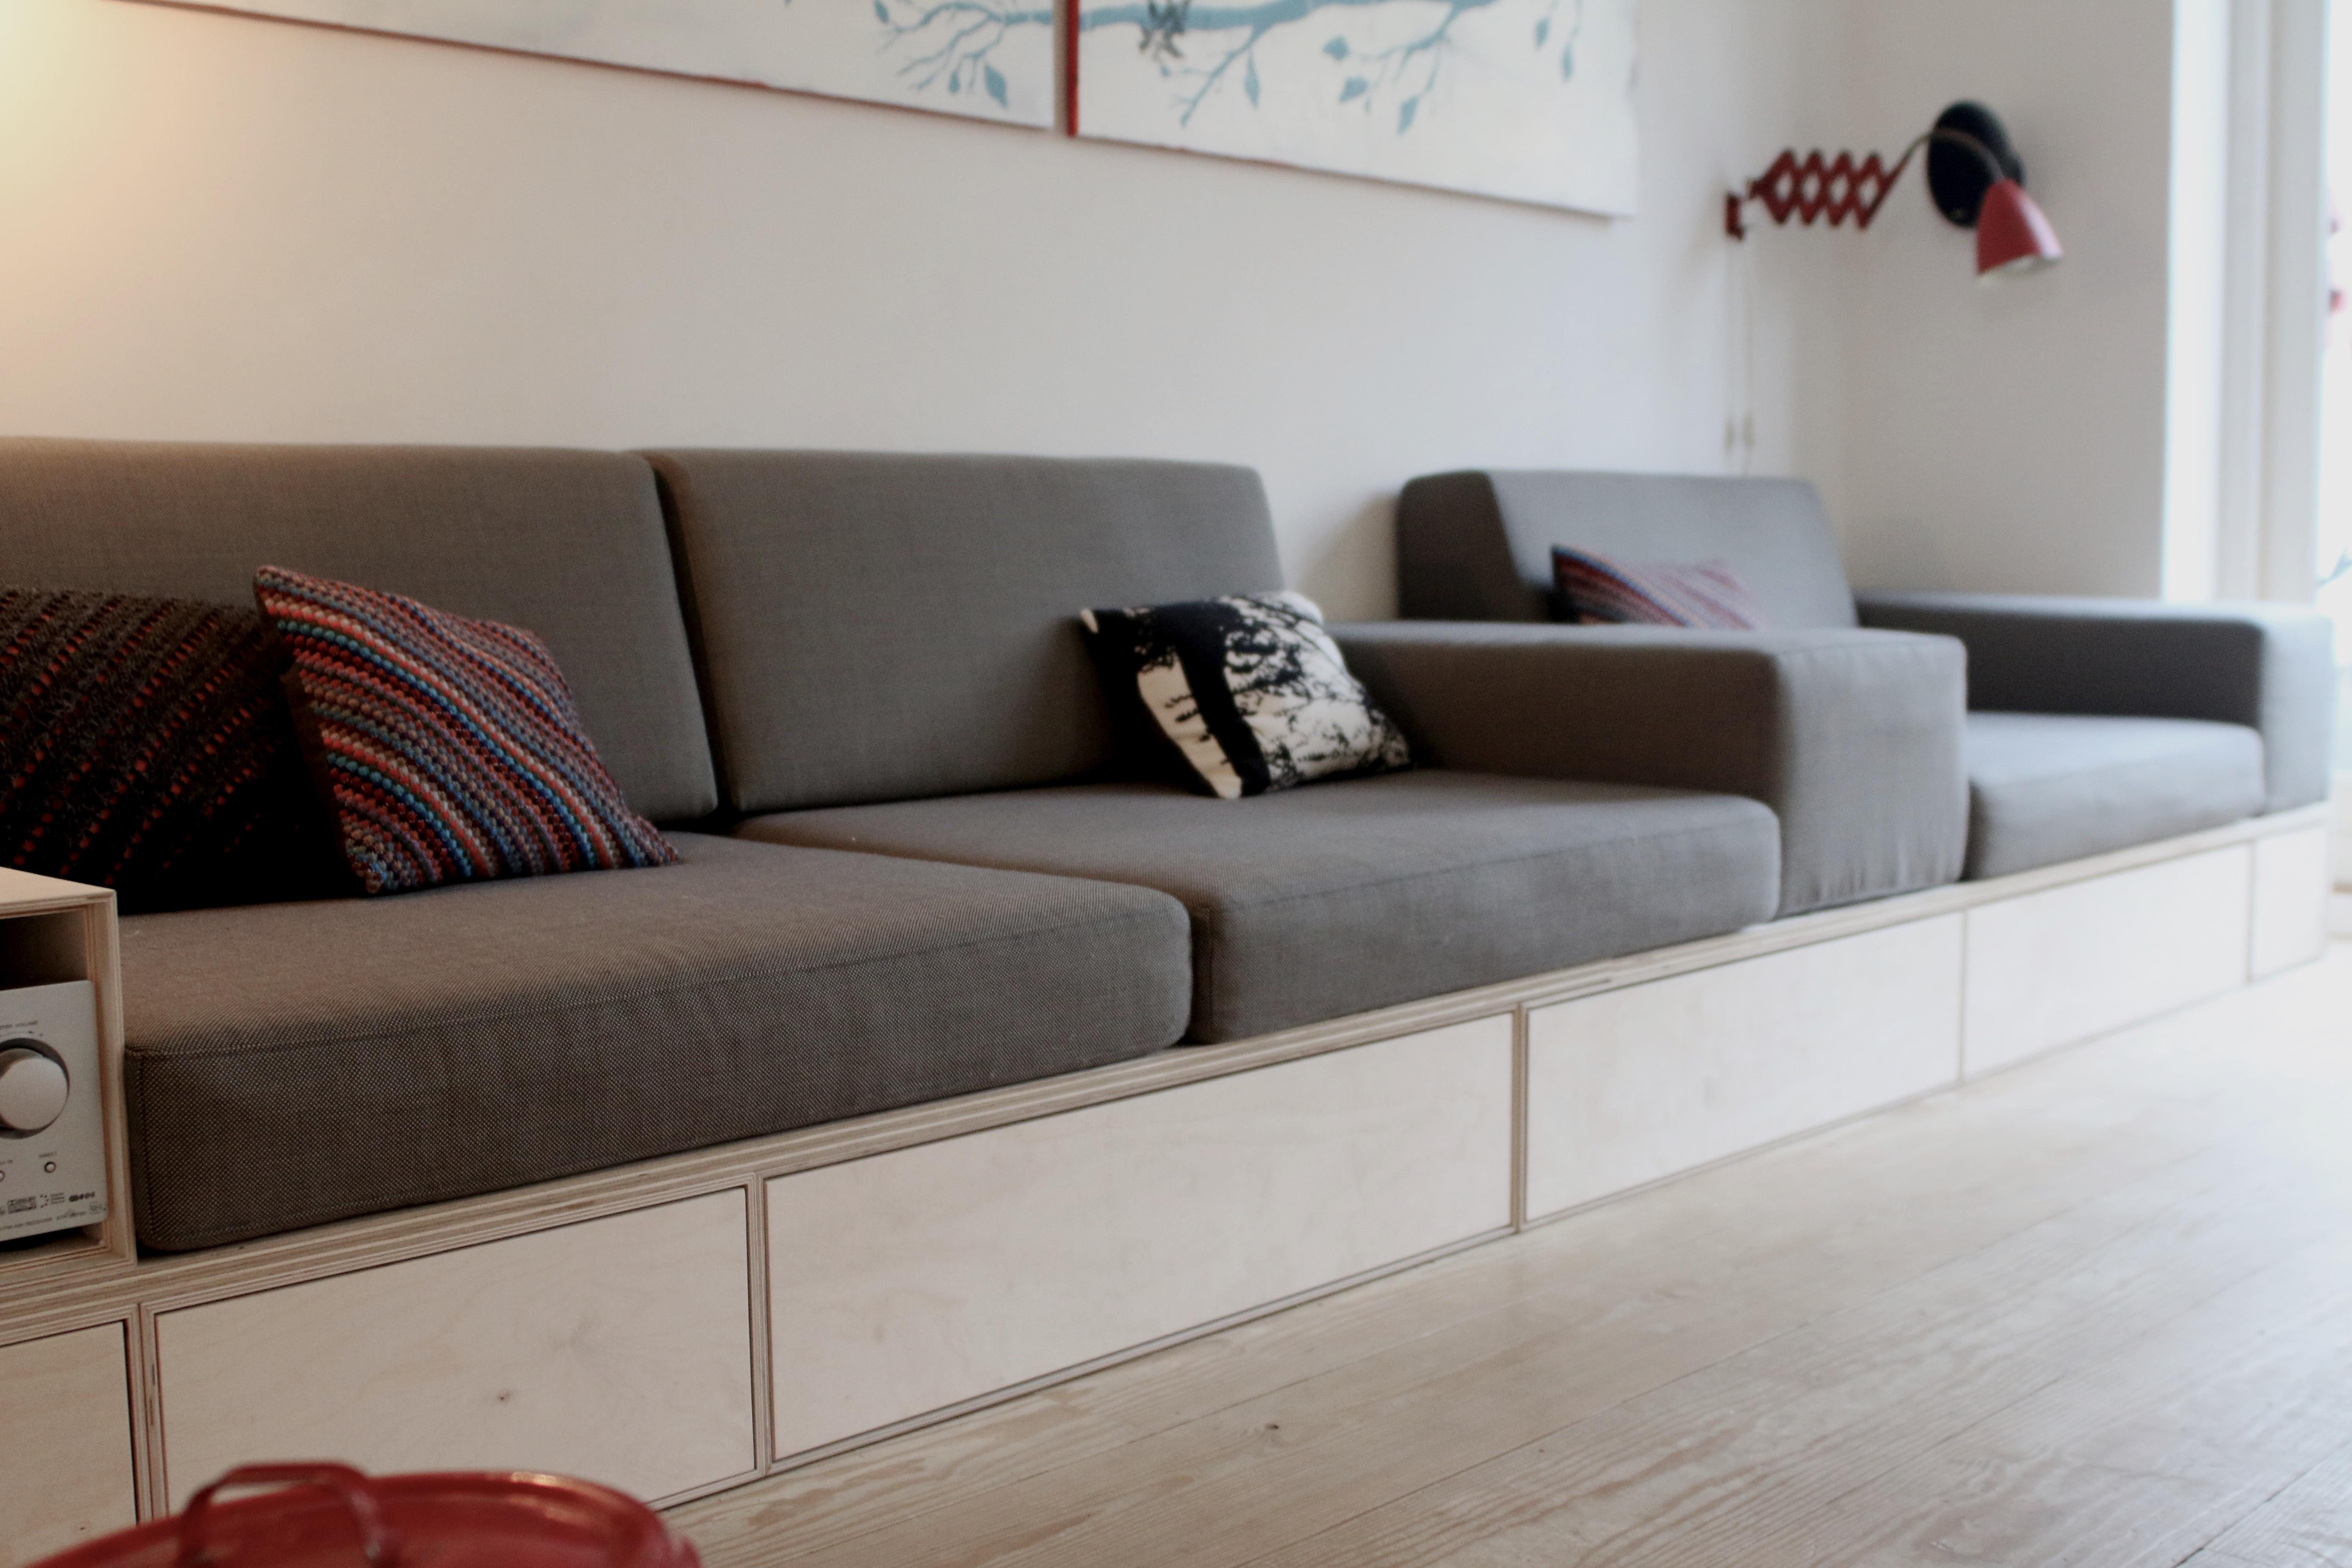 Bygge hjørnesofa – La réparation des appartements